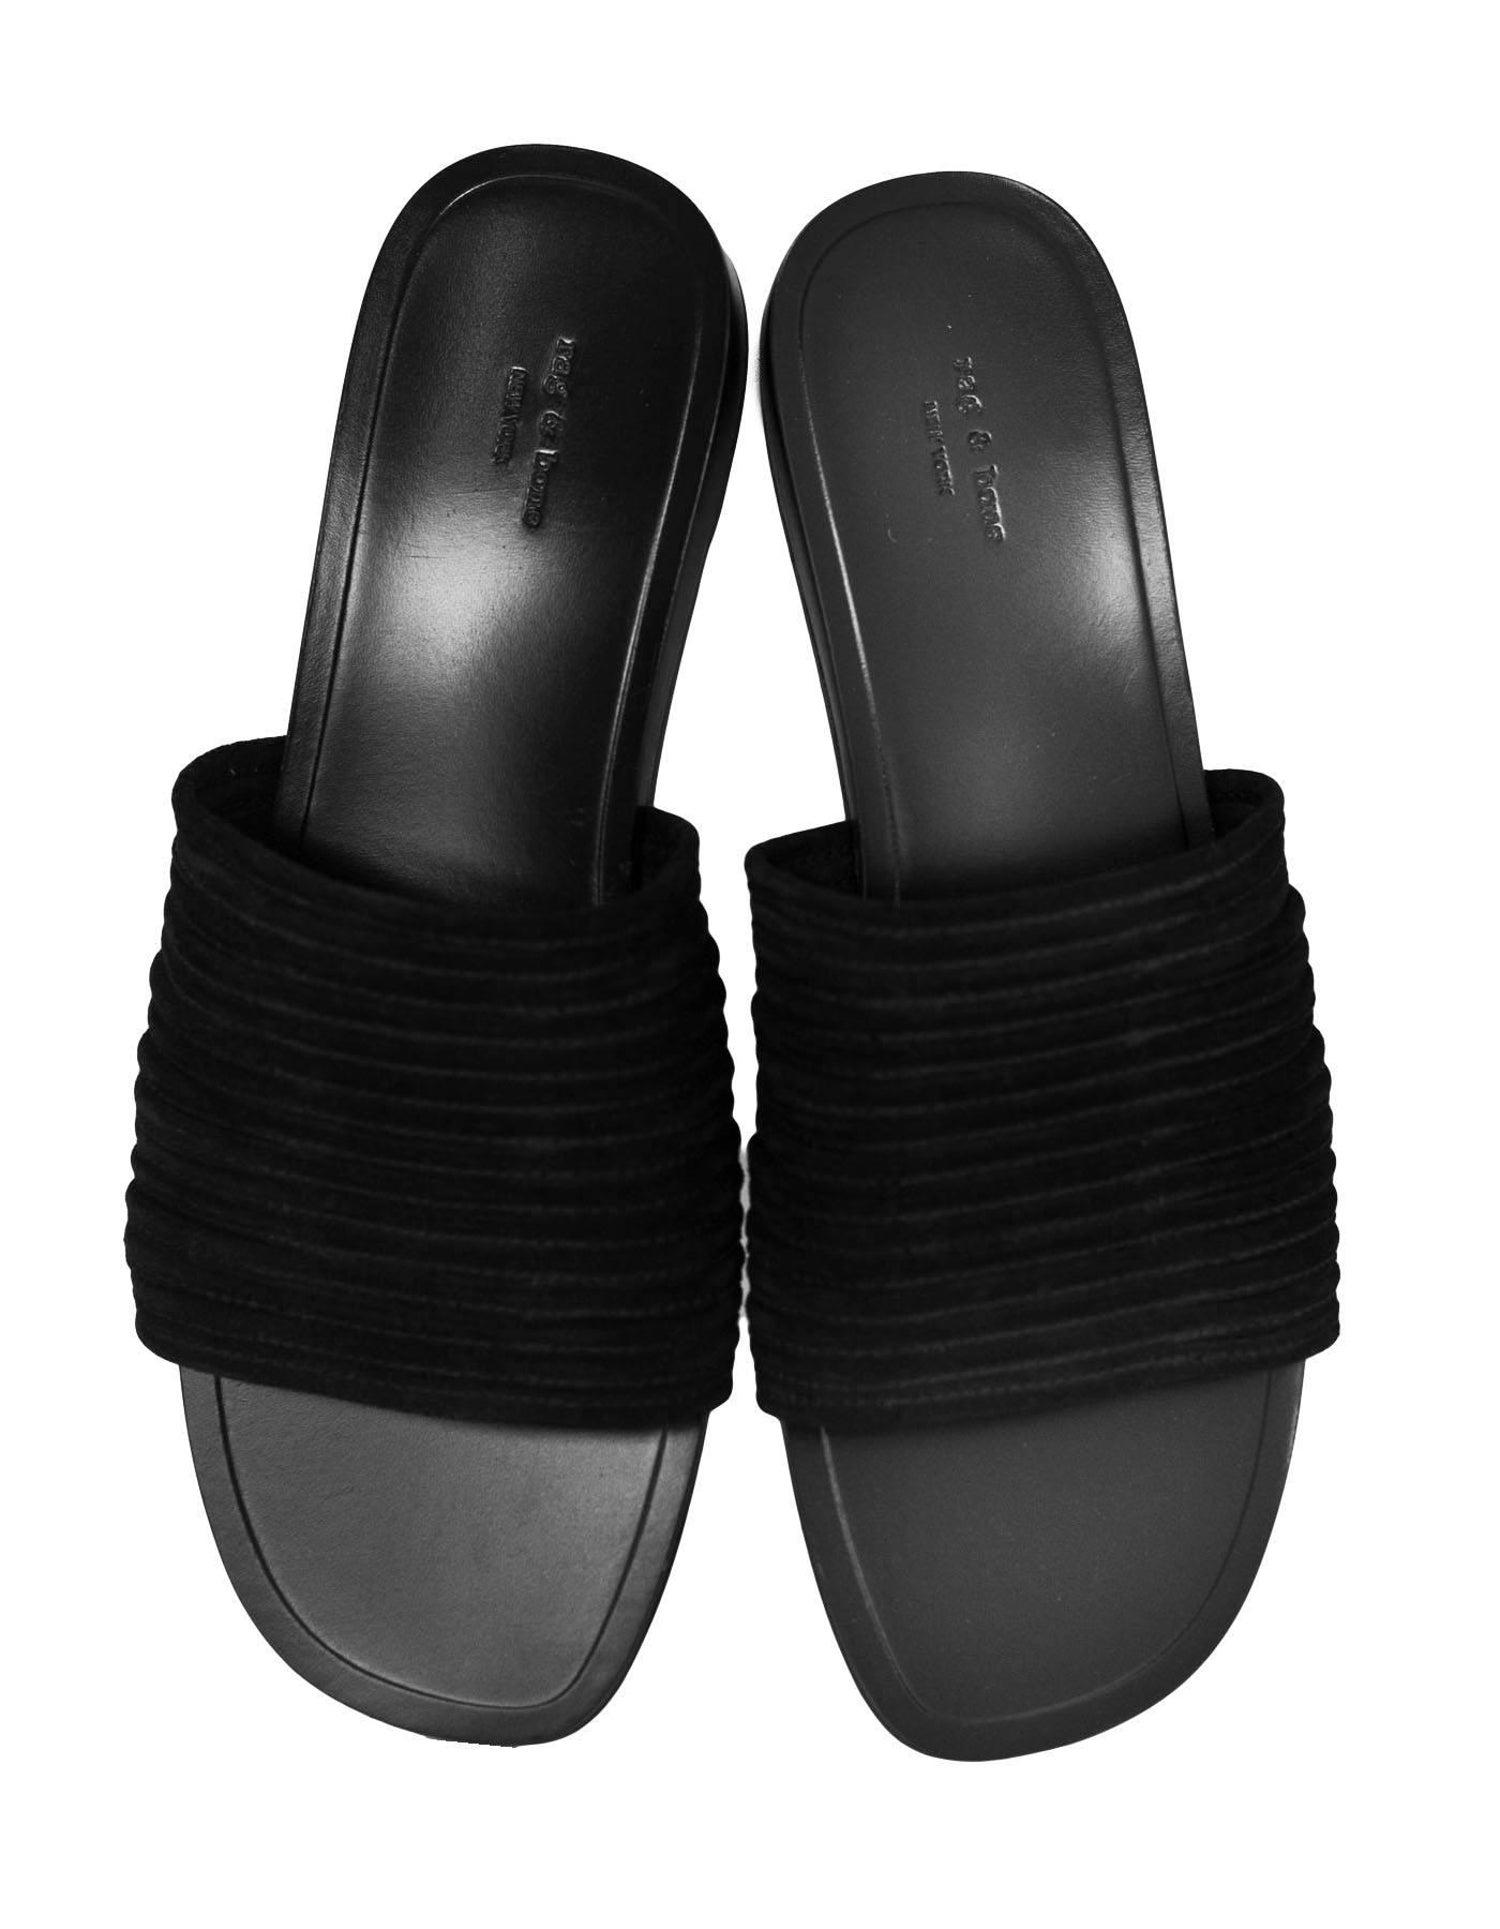 b544db2fec80b4 Rag and Bone Black Suede Cameron Slide Sandals Sz 39.5 For Sale at 1stdibs